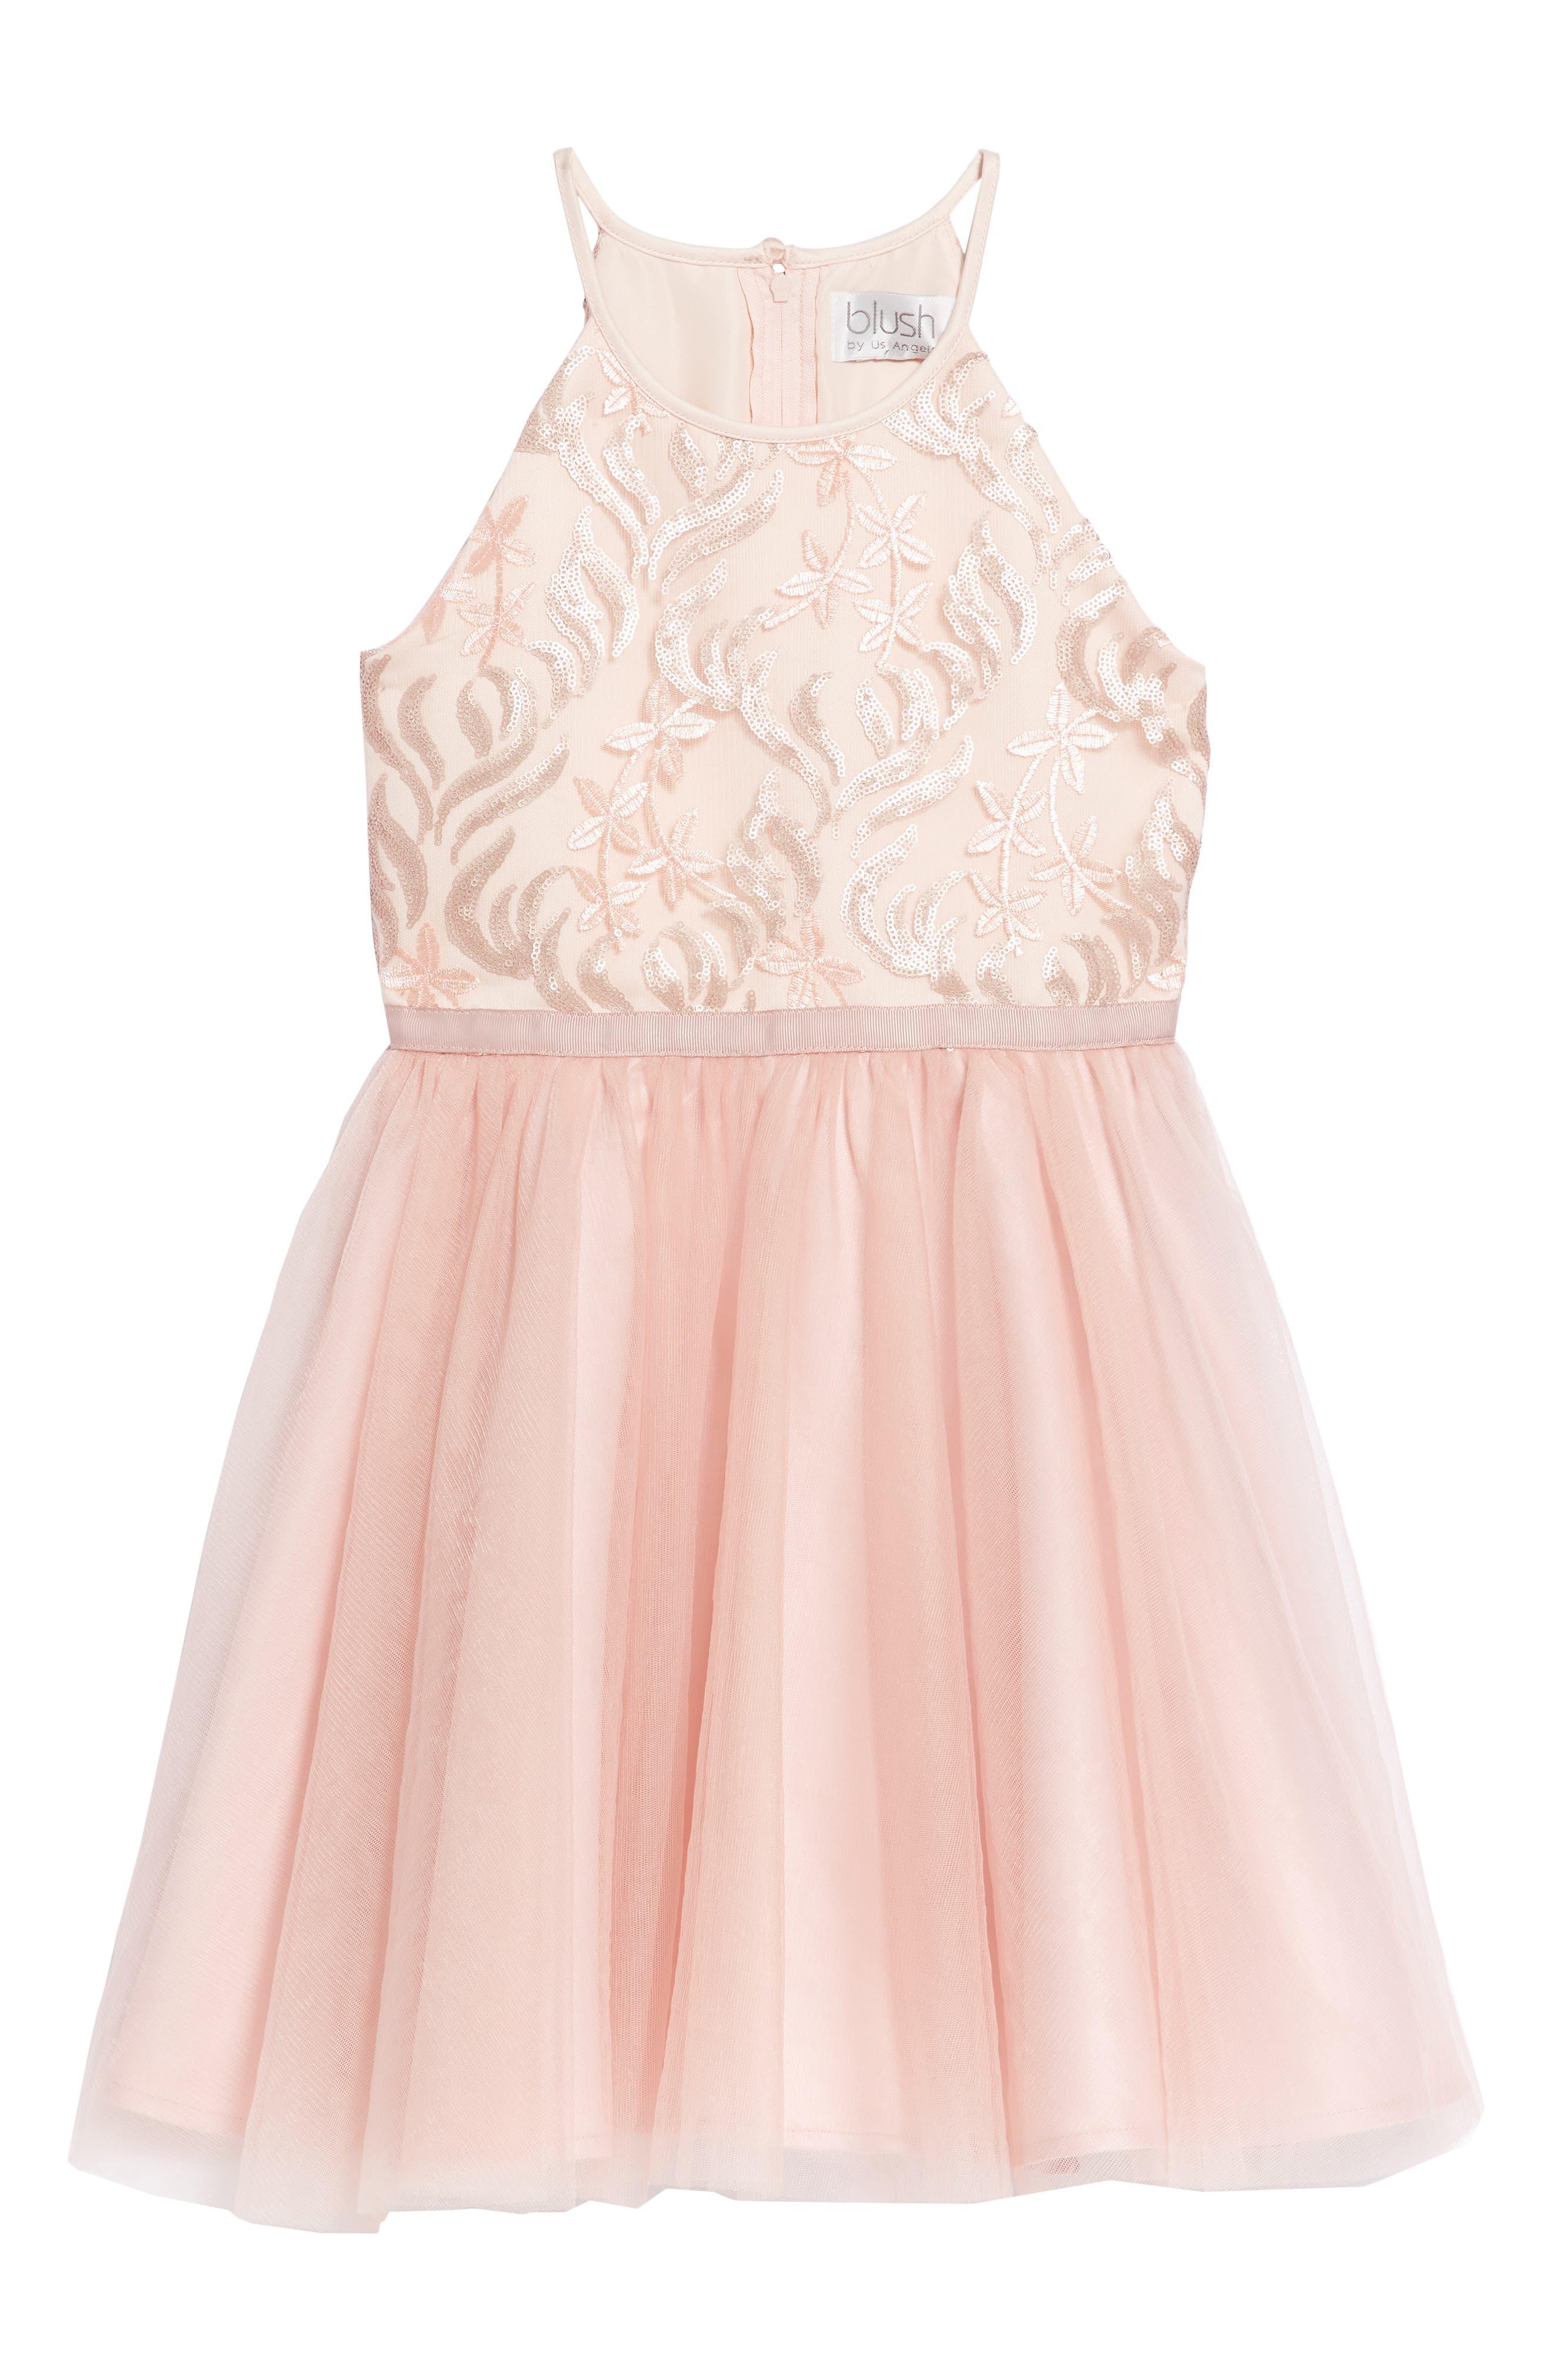 Sequin Tutu Dress,                             Main thumbnail 1, color,                             685